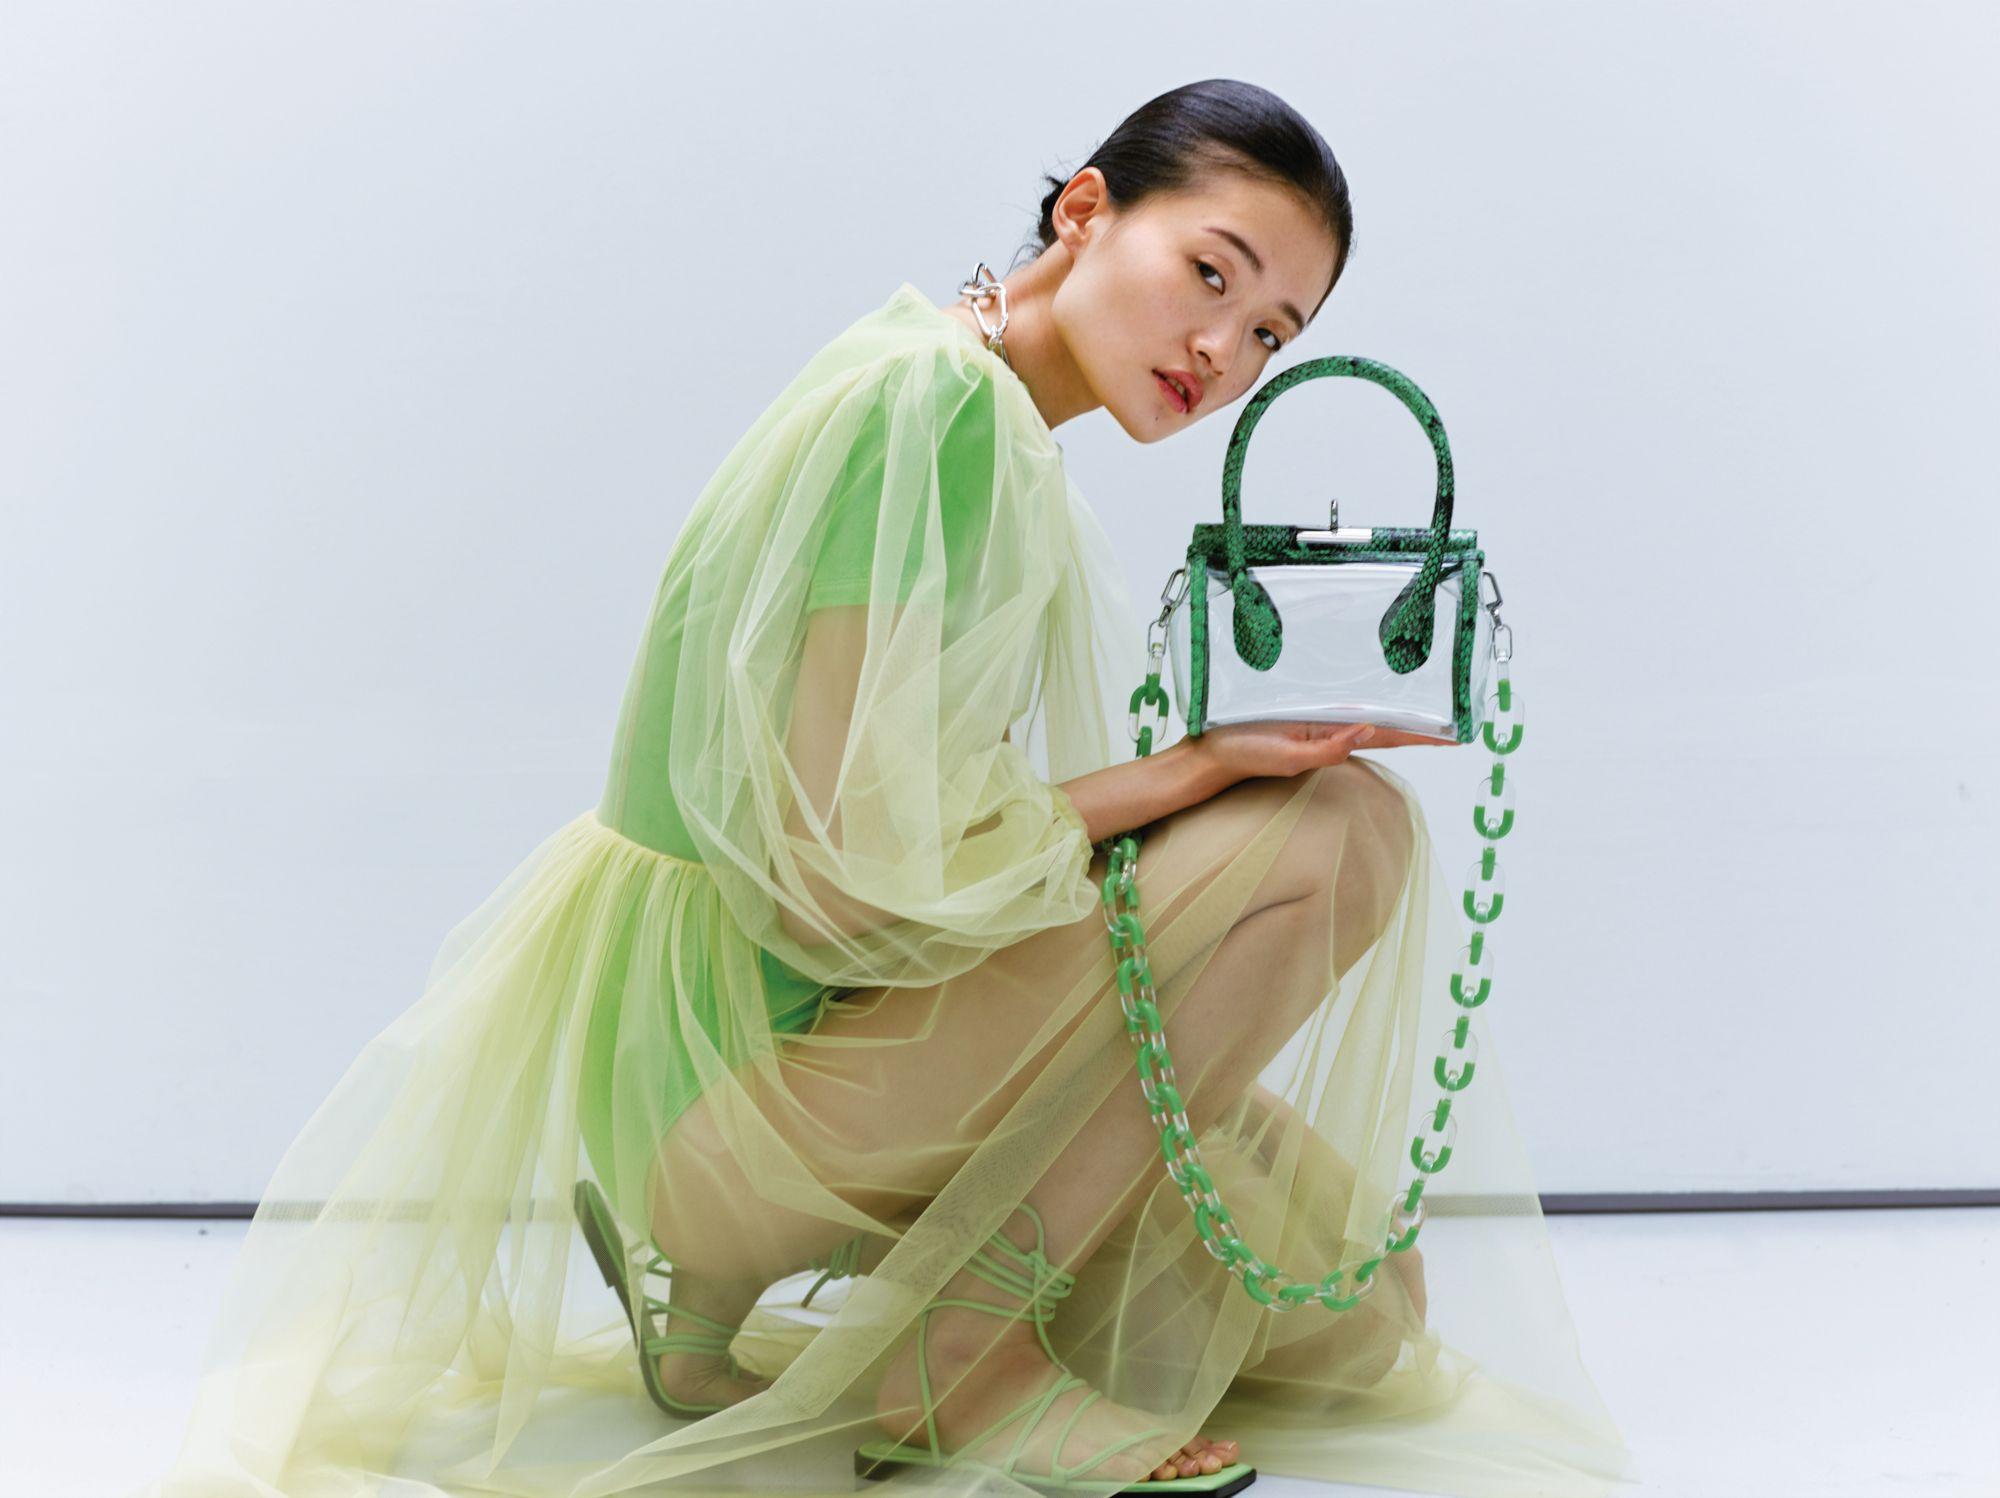 South Korean Designer Ji Hye Koo Talks  About Her Fashion Journey And Future Goals